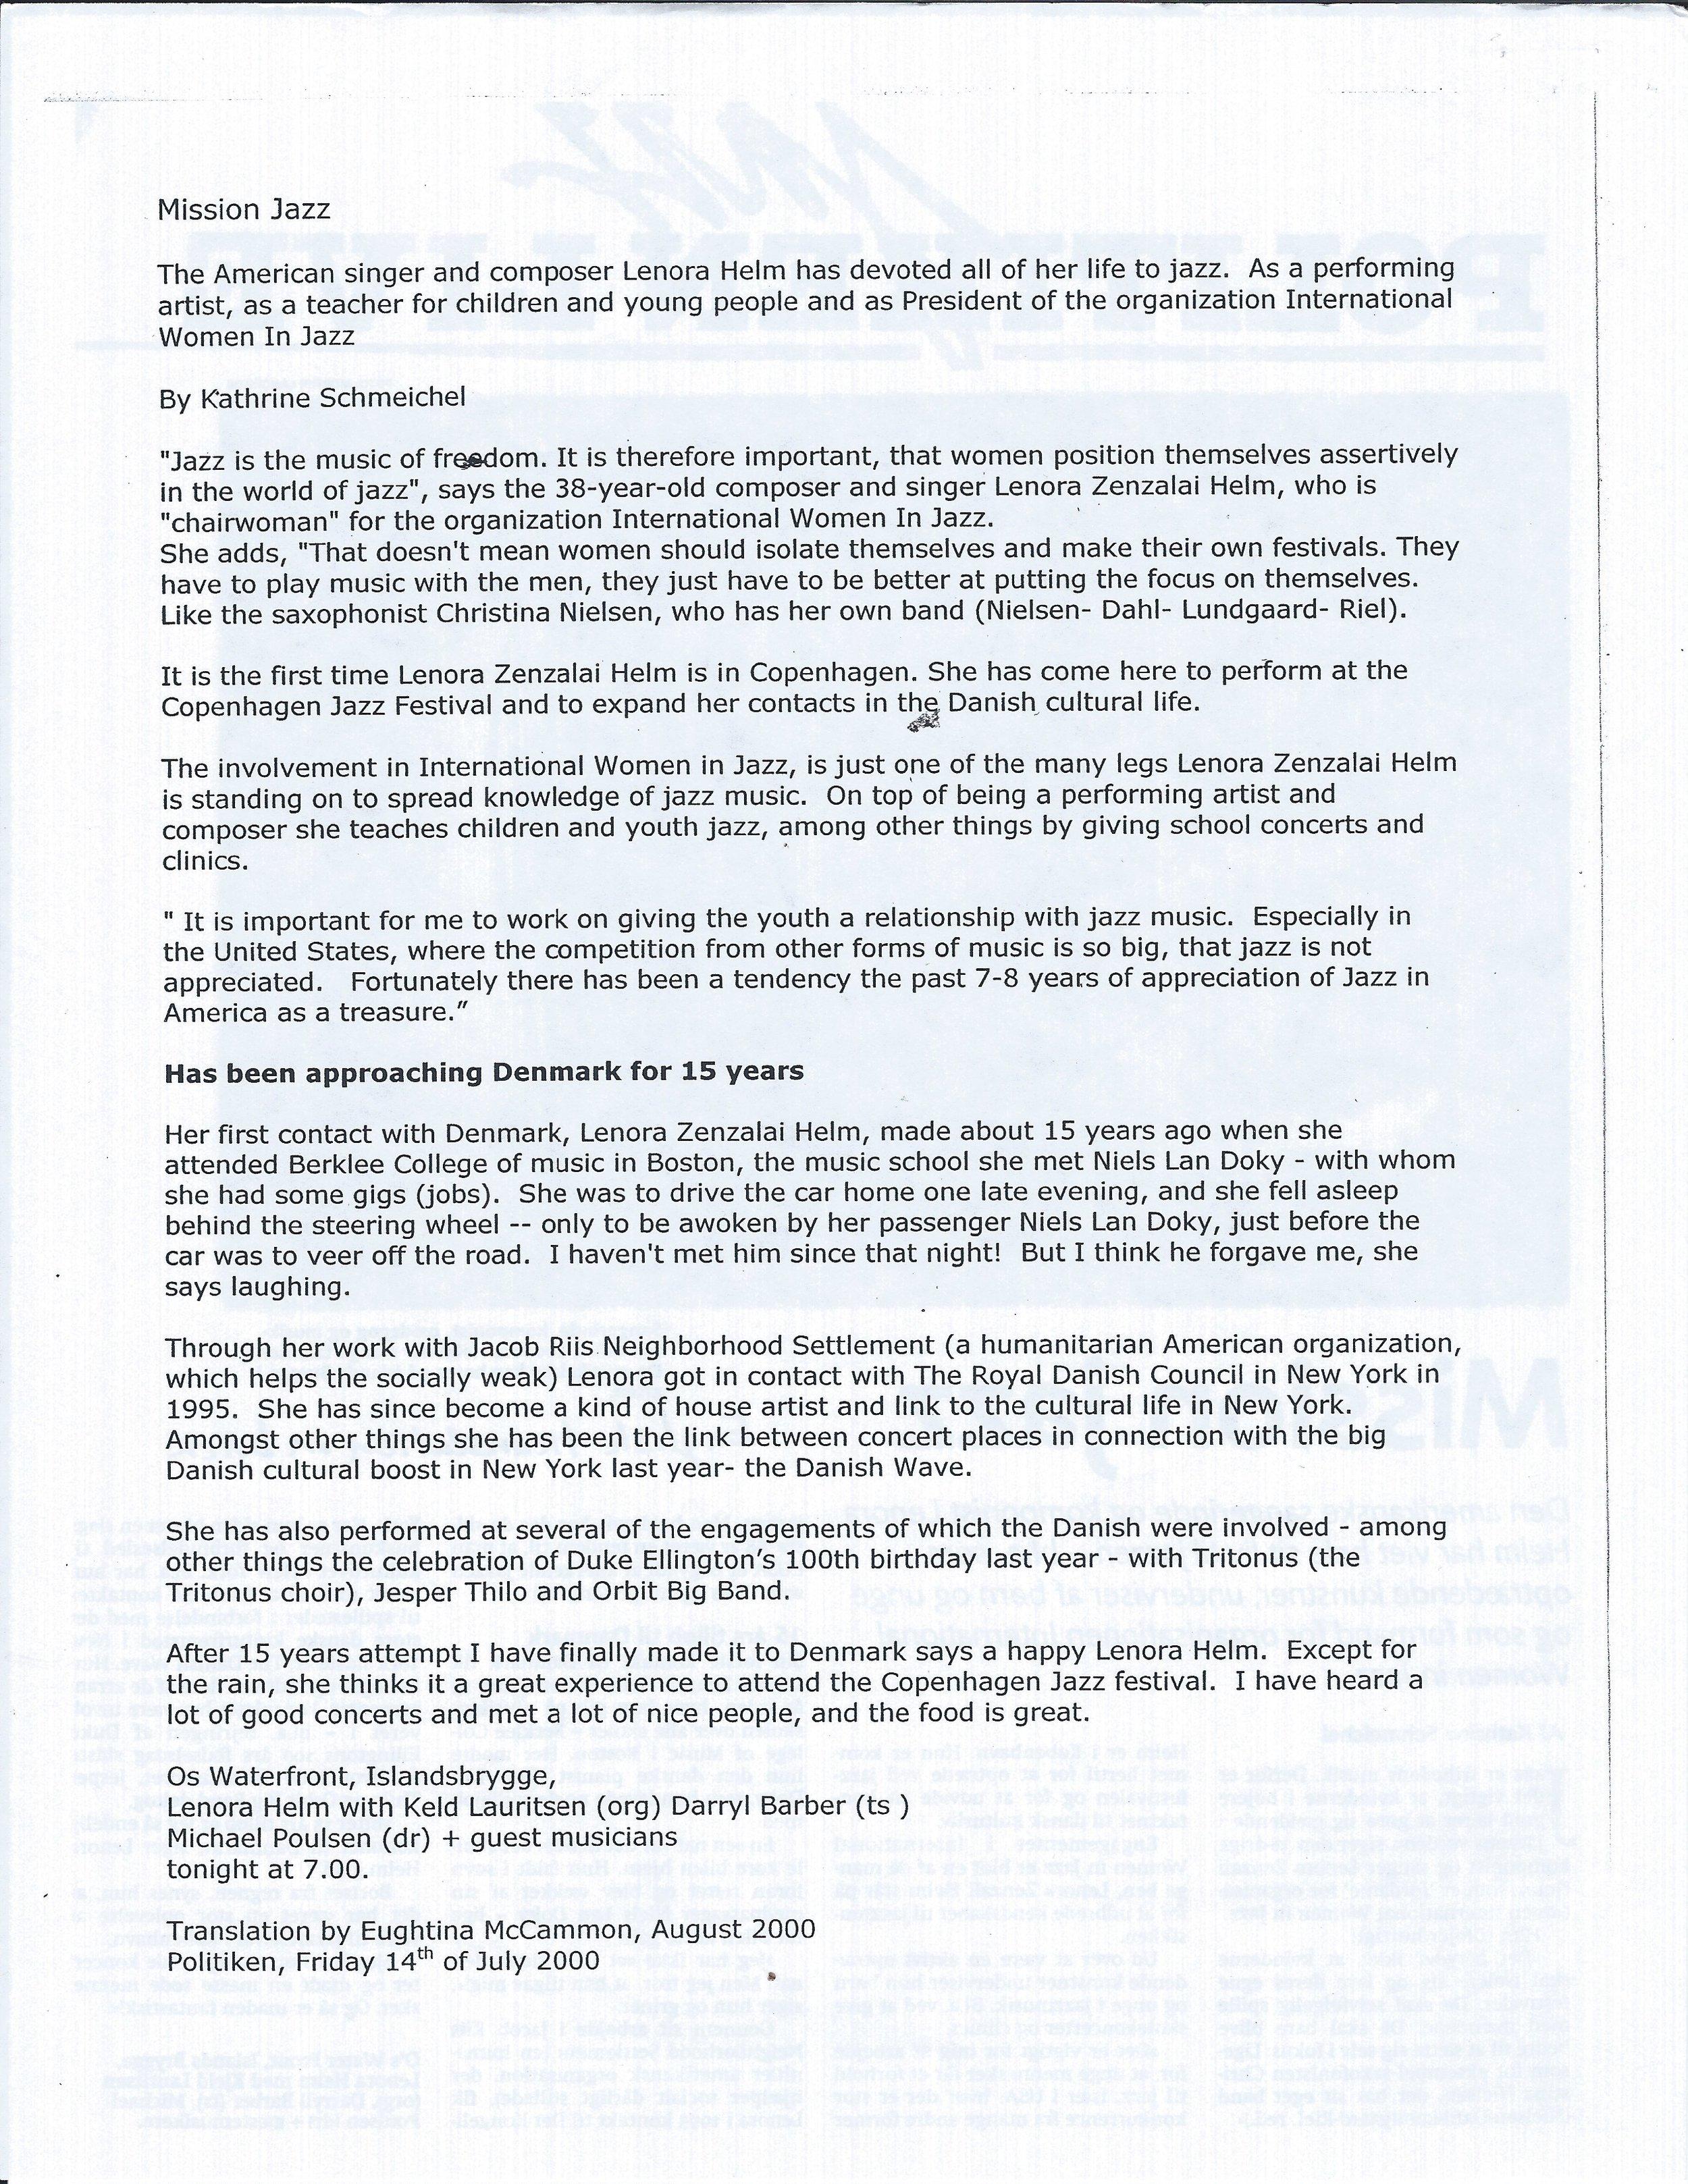 Politiken Live Article English Translation jpeg copy.jpg